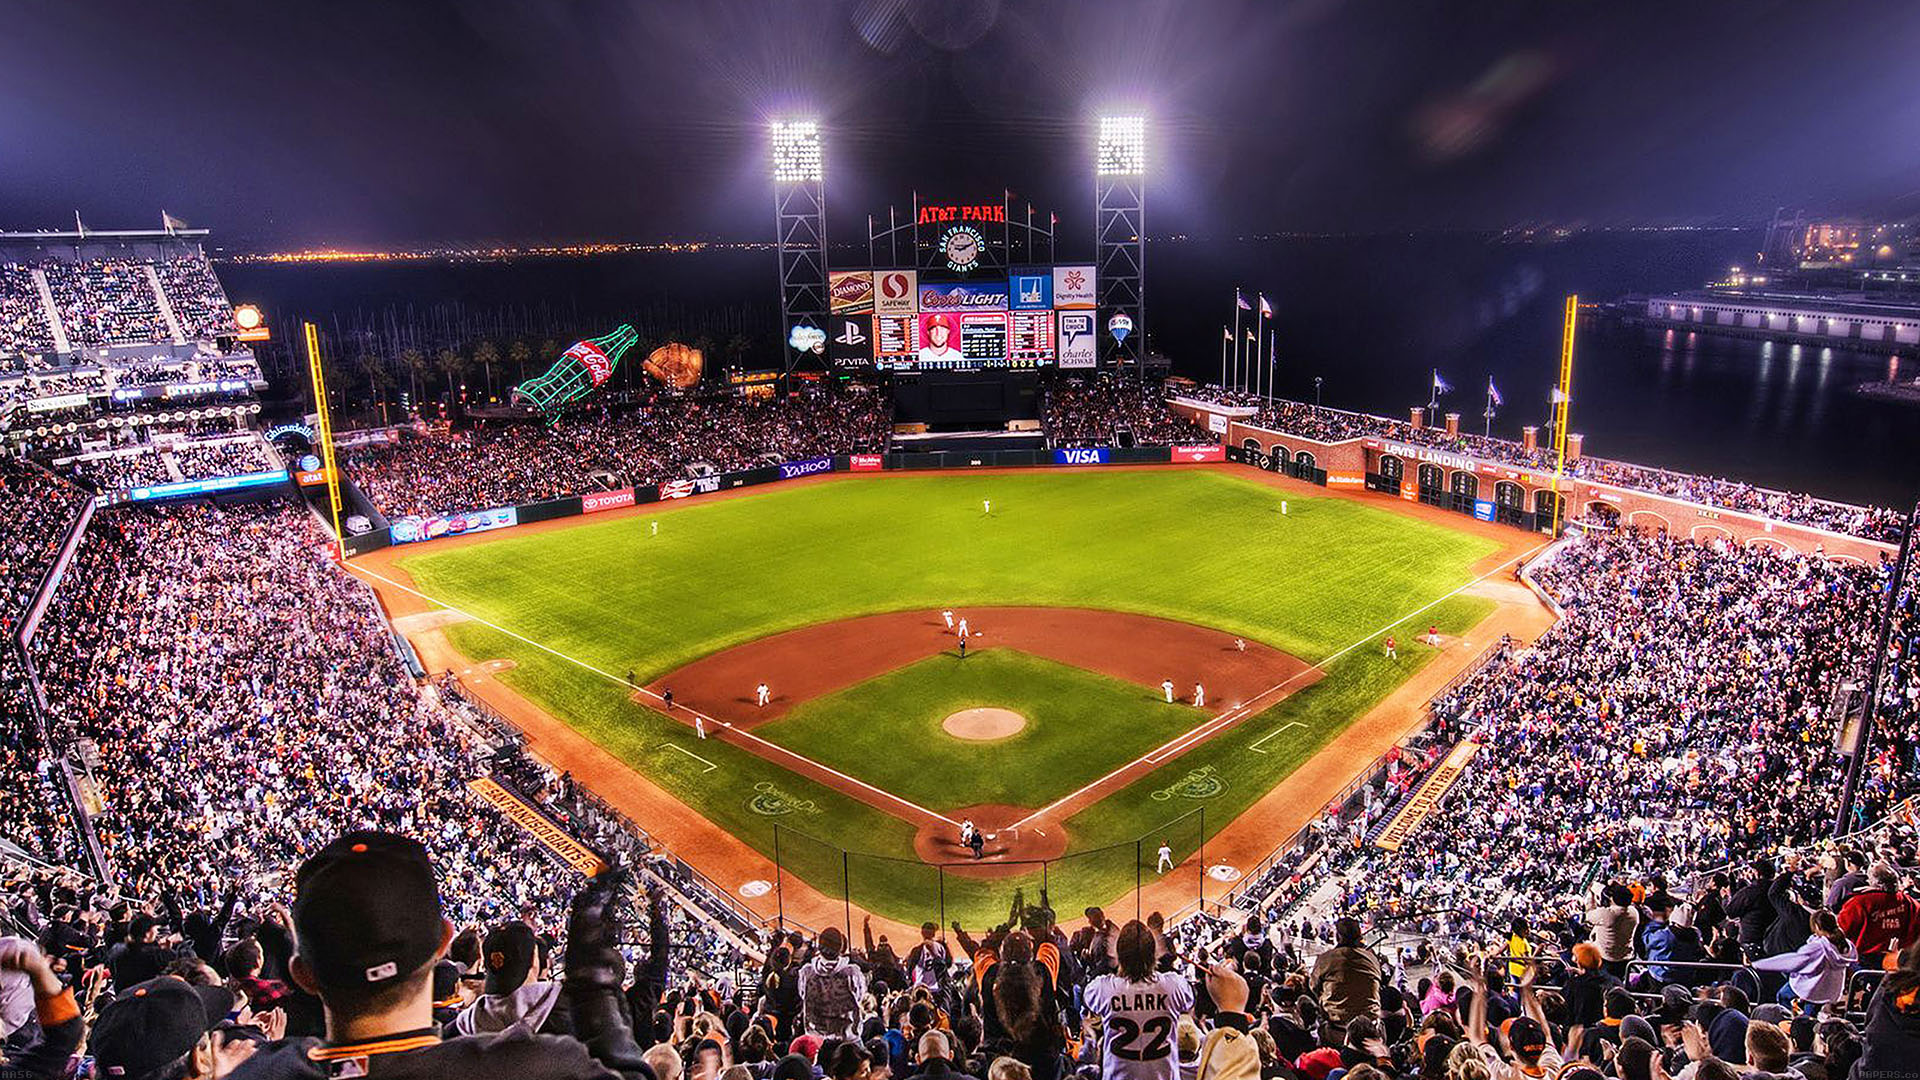 aa57-baseball-stadium-sports-art - Papers.co